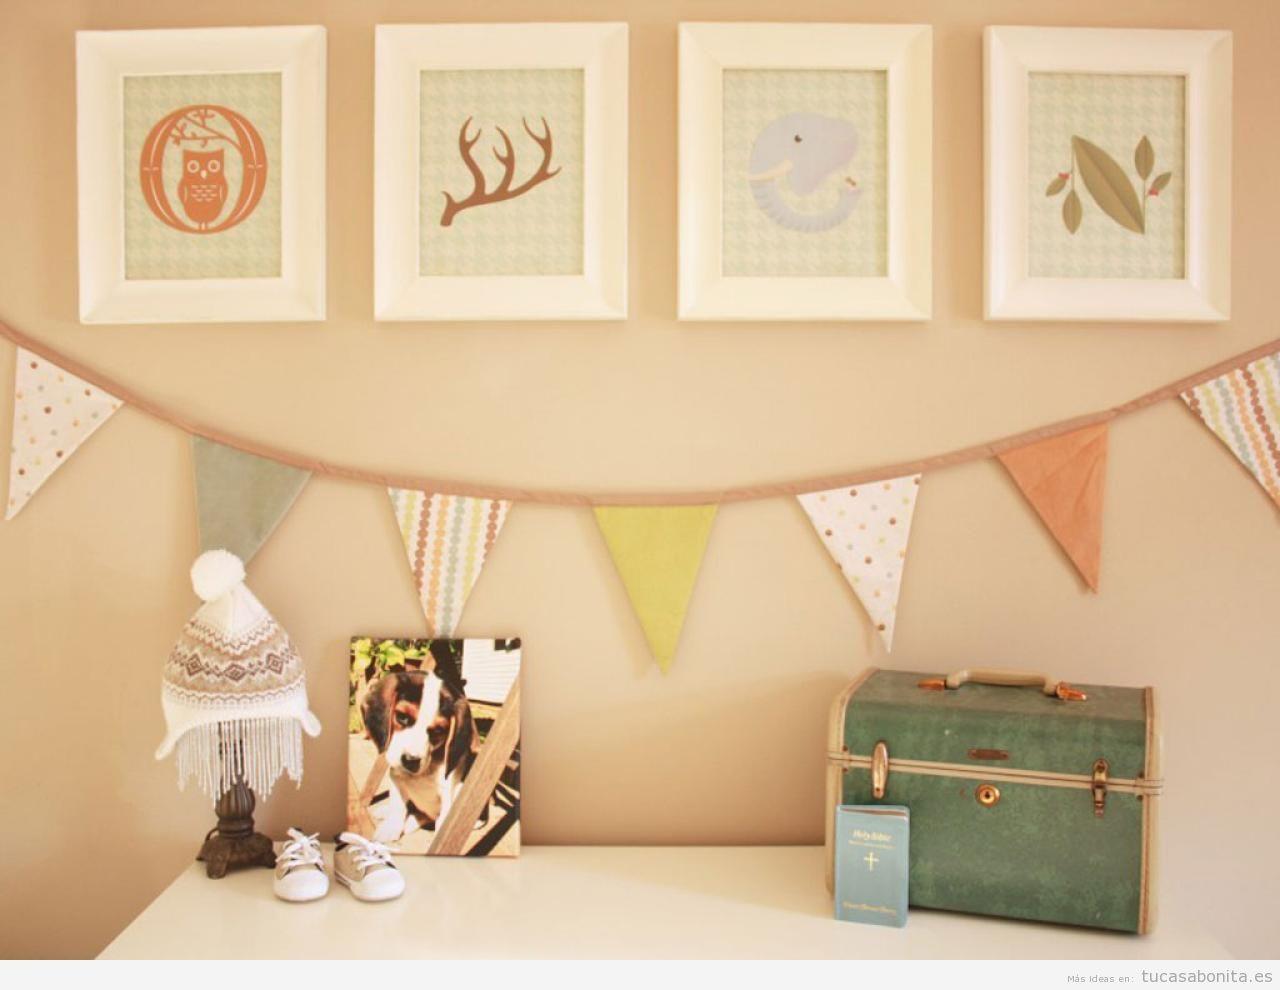 Pin de ximena duarte en dormitorio de bebe decorar - Como decorar el dormitorio de un bebe ...